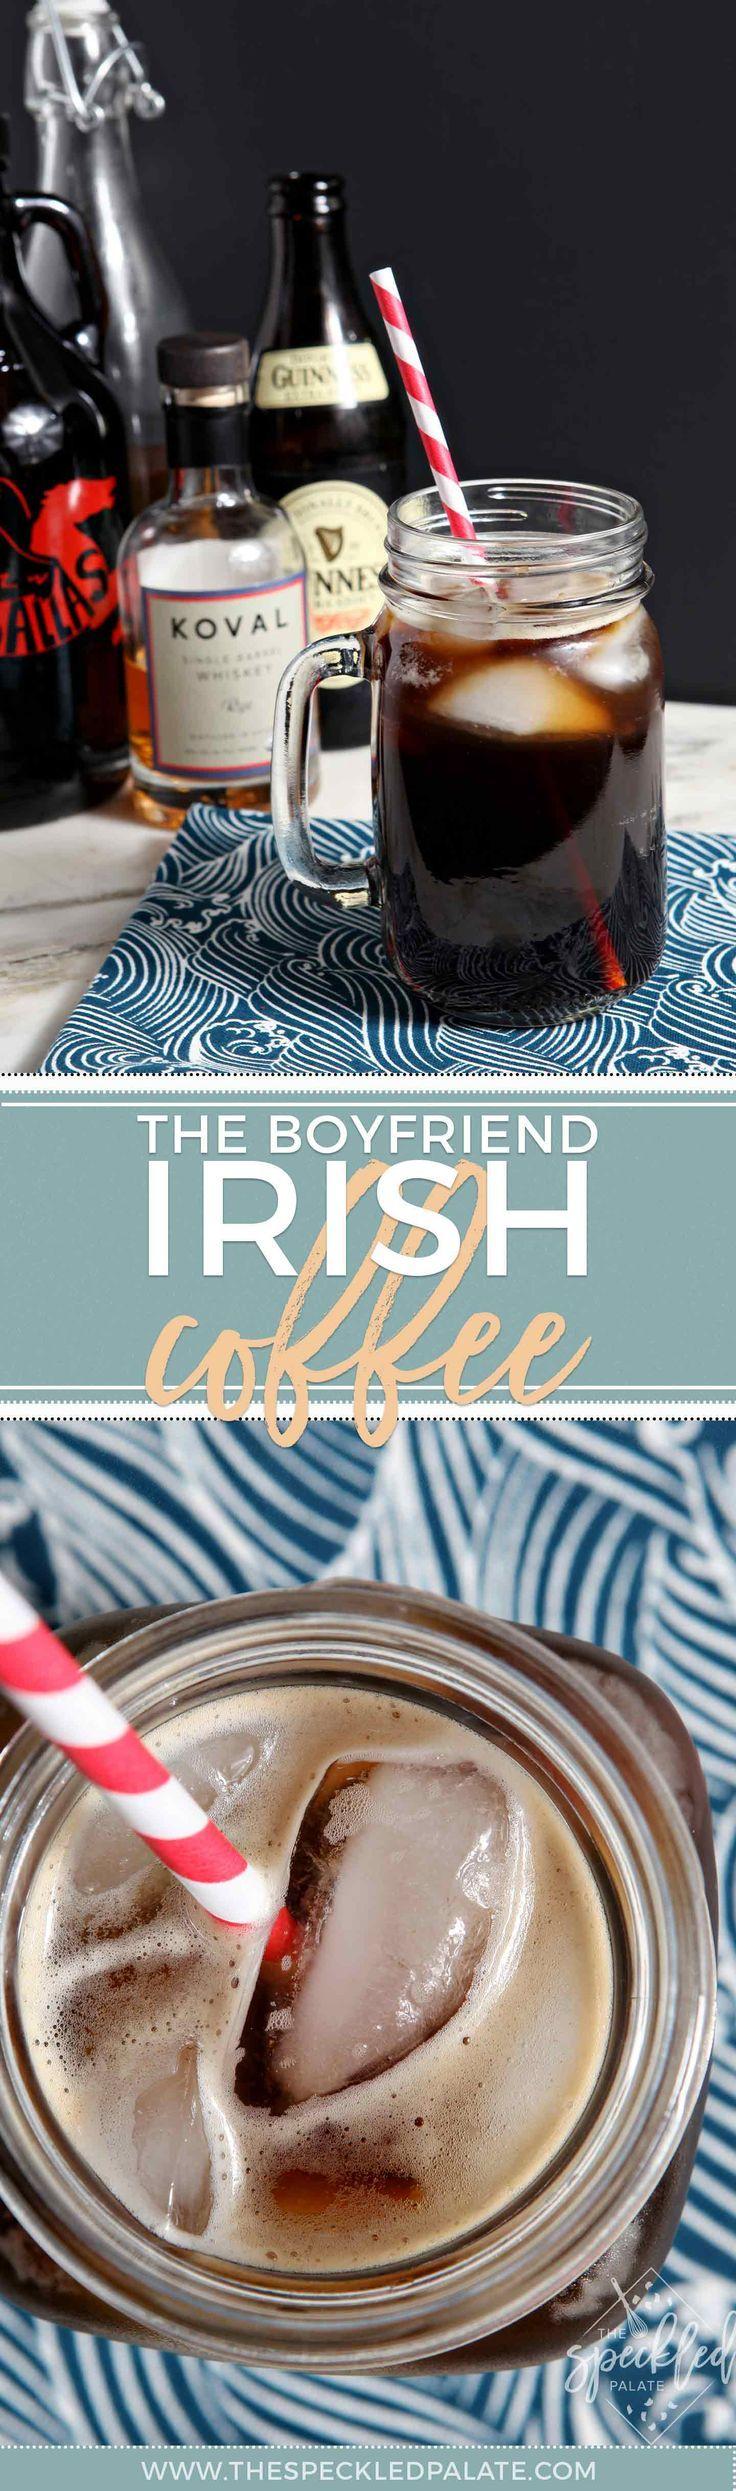 A take on traditional Irish coffee, the Boyfriend Irish Coffee